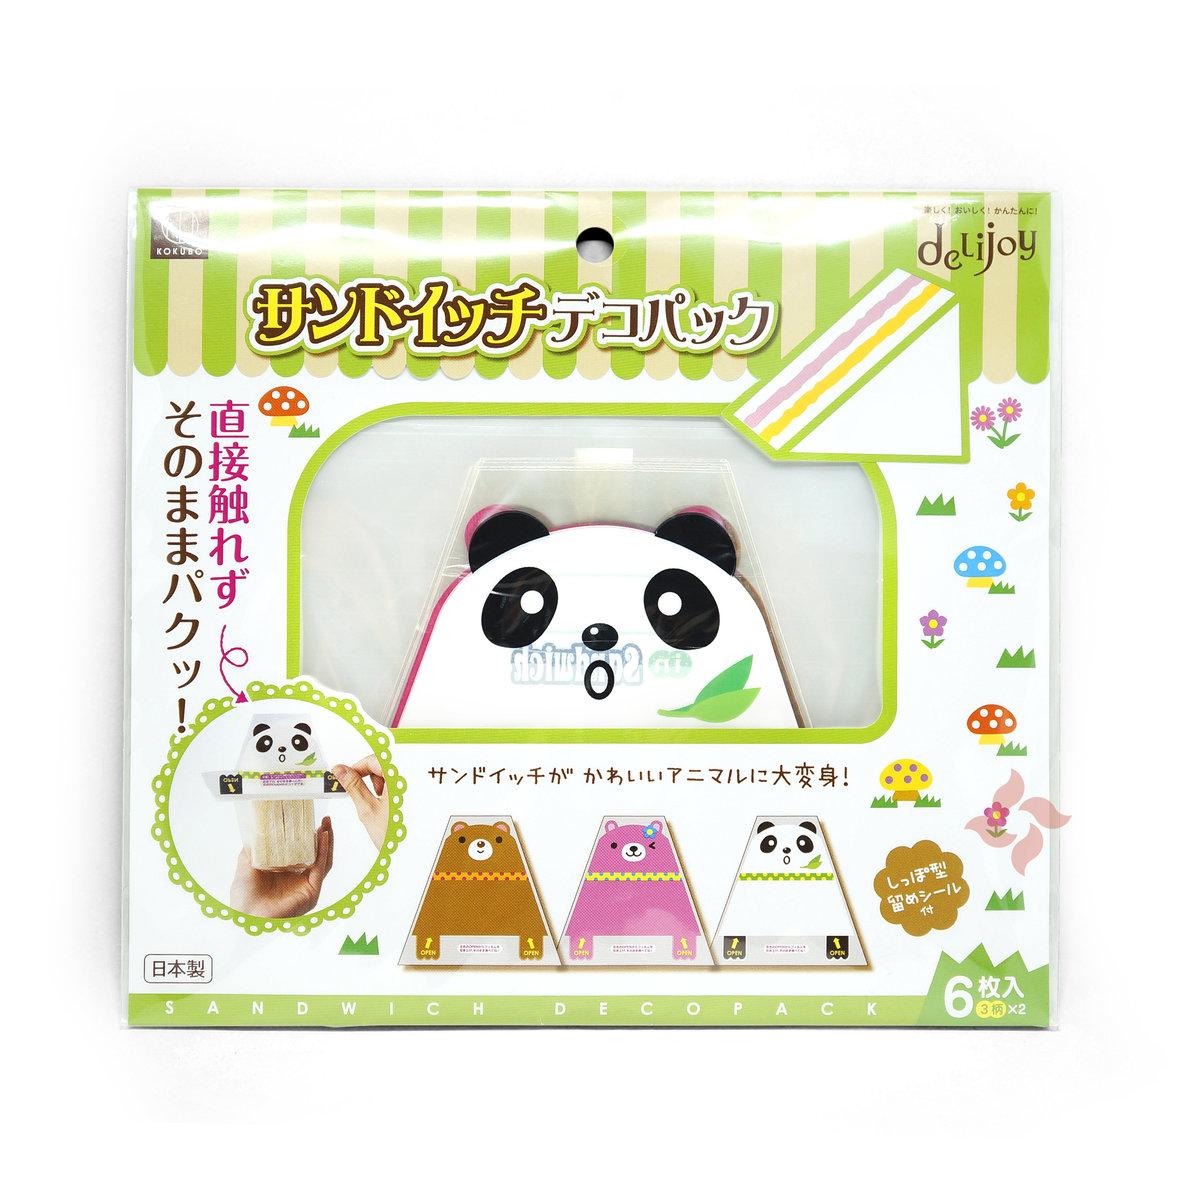 KOKUBO  日本小久保deLijoy 三明治包裝膜 (4956810801121)